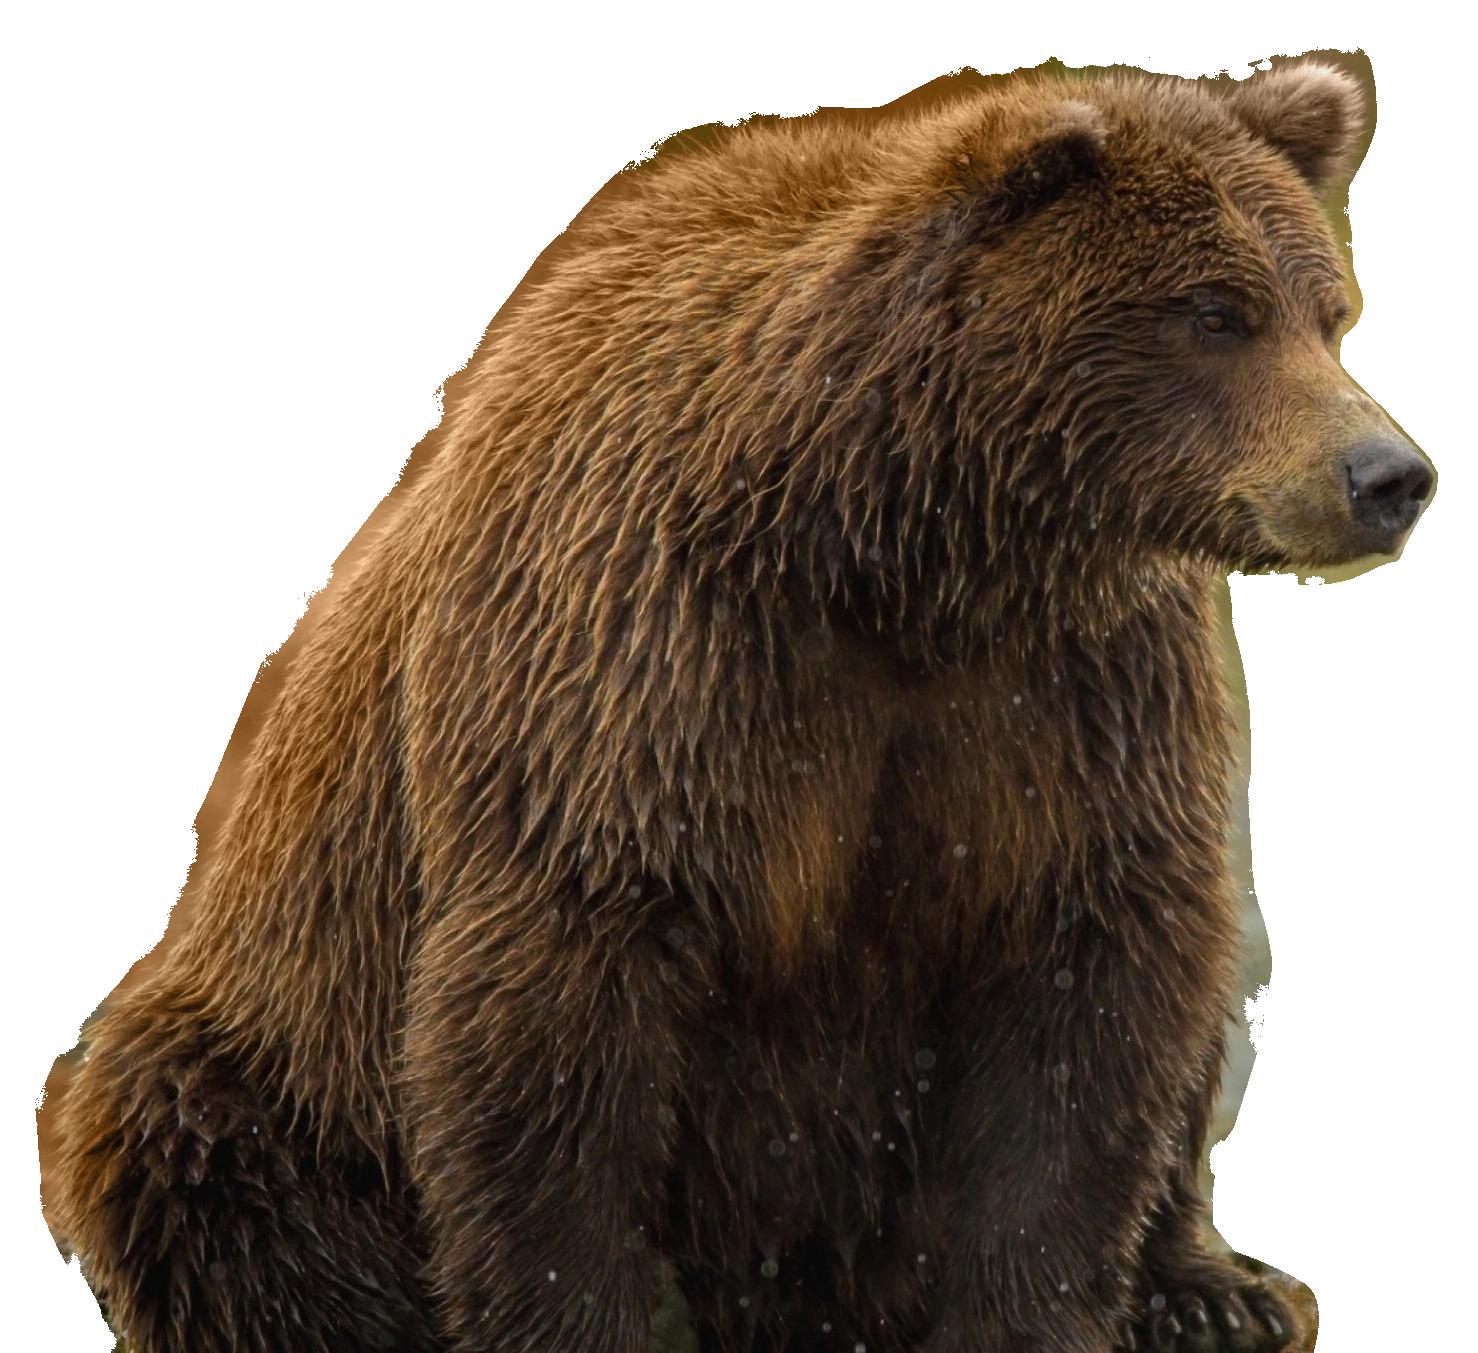 Bear PNG - 13185